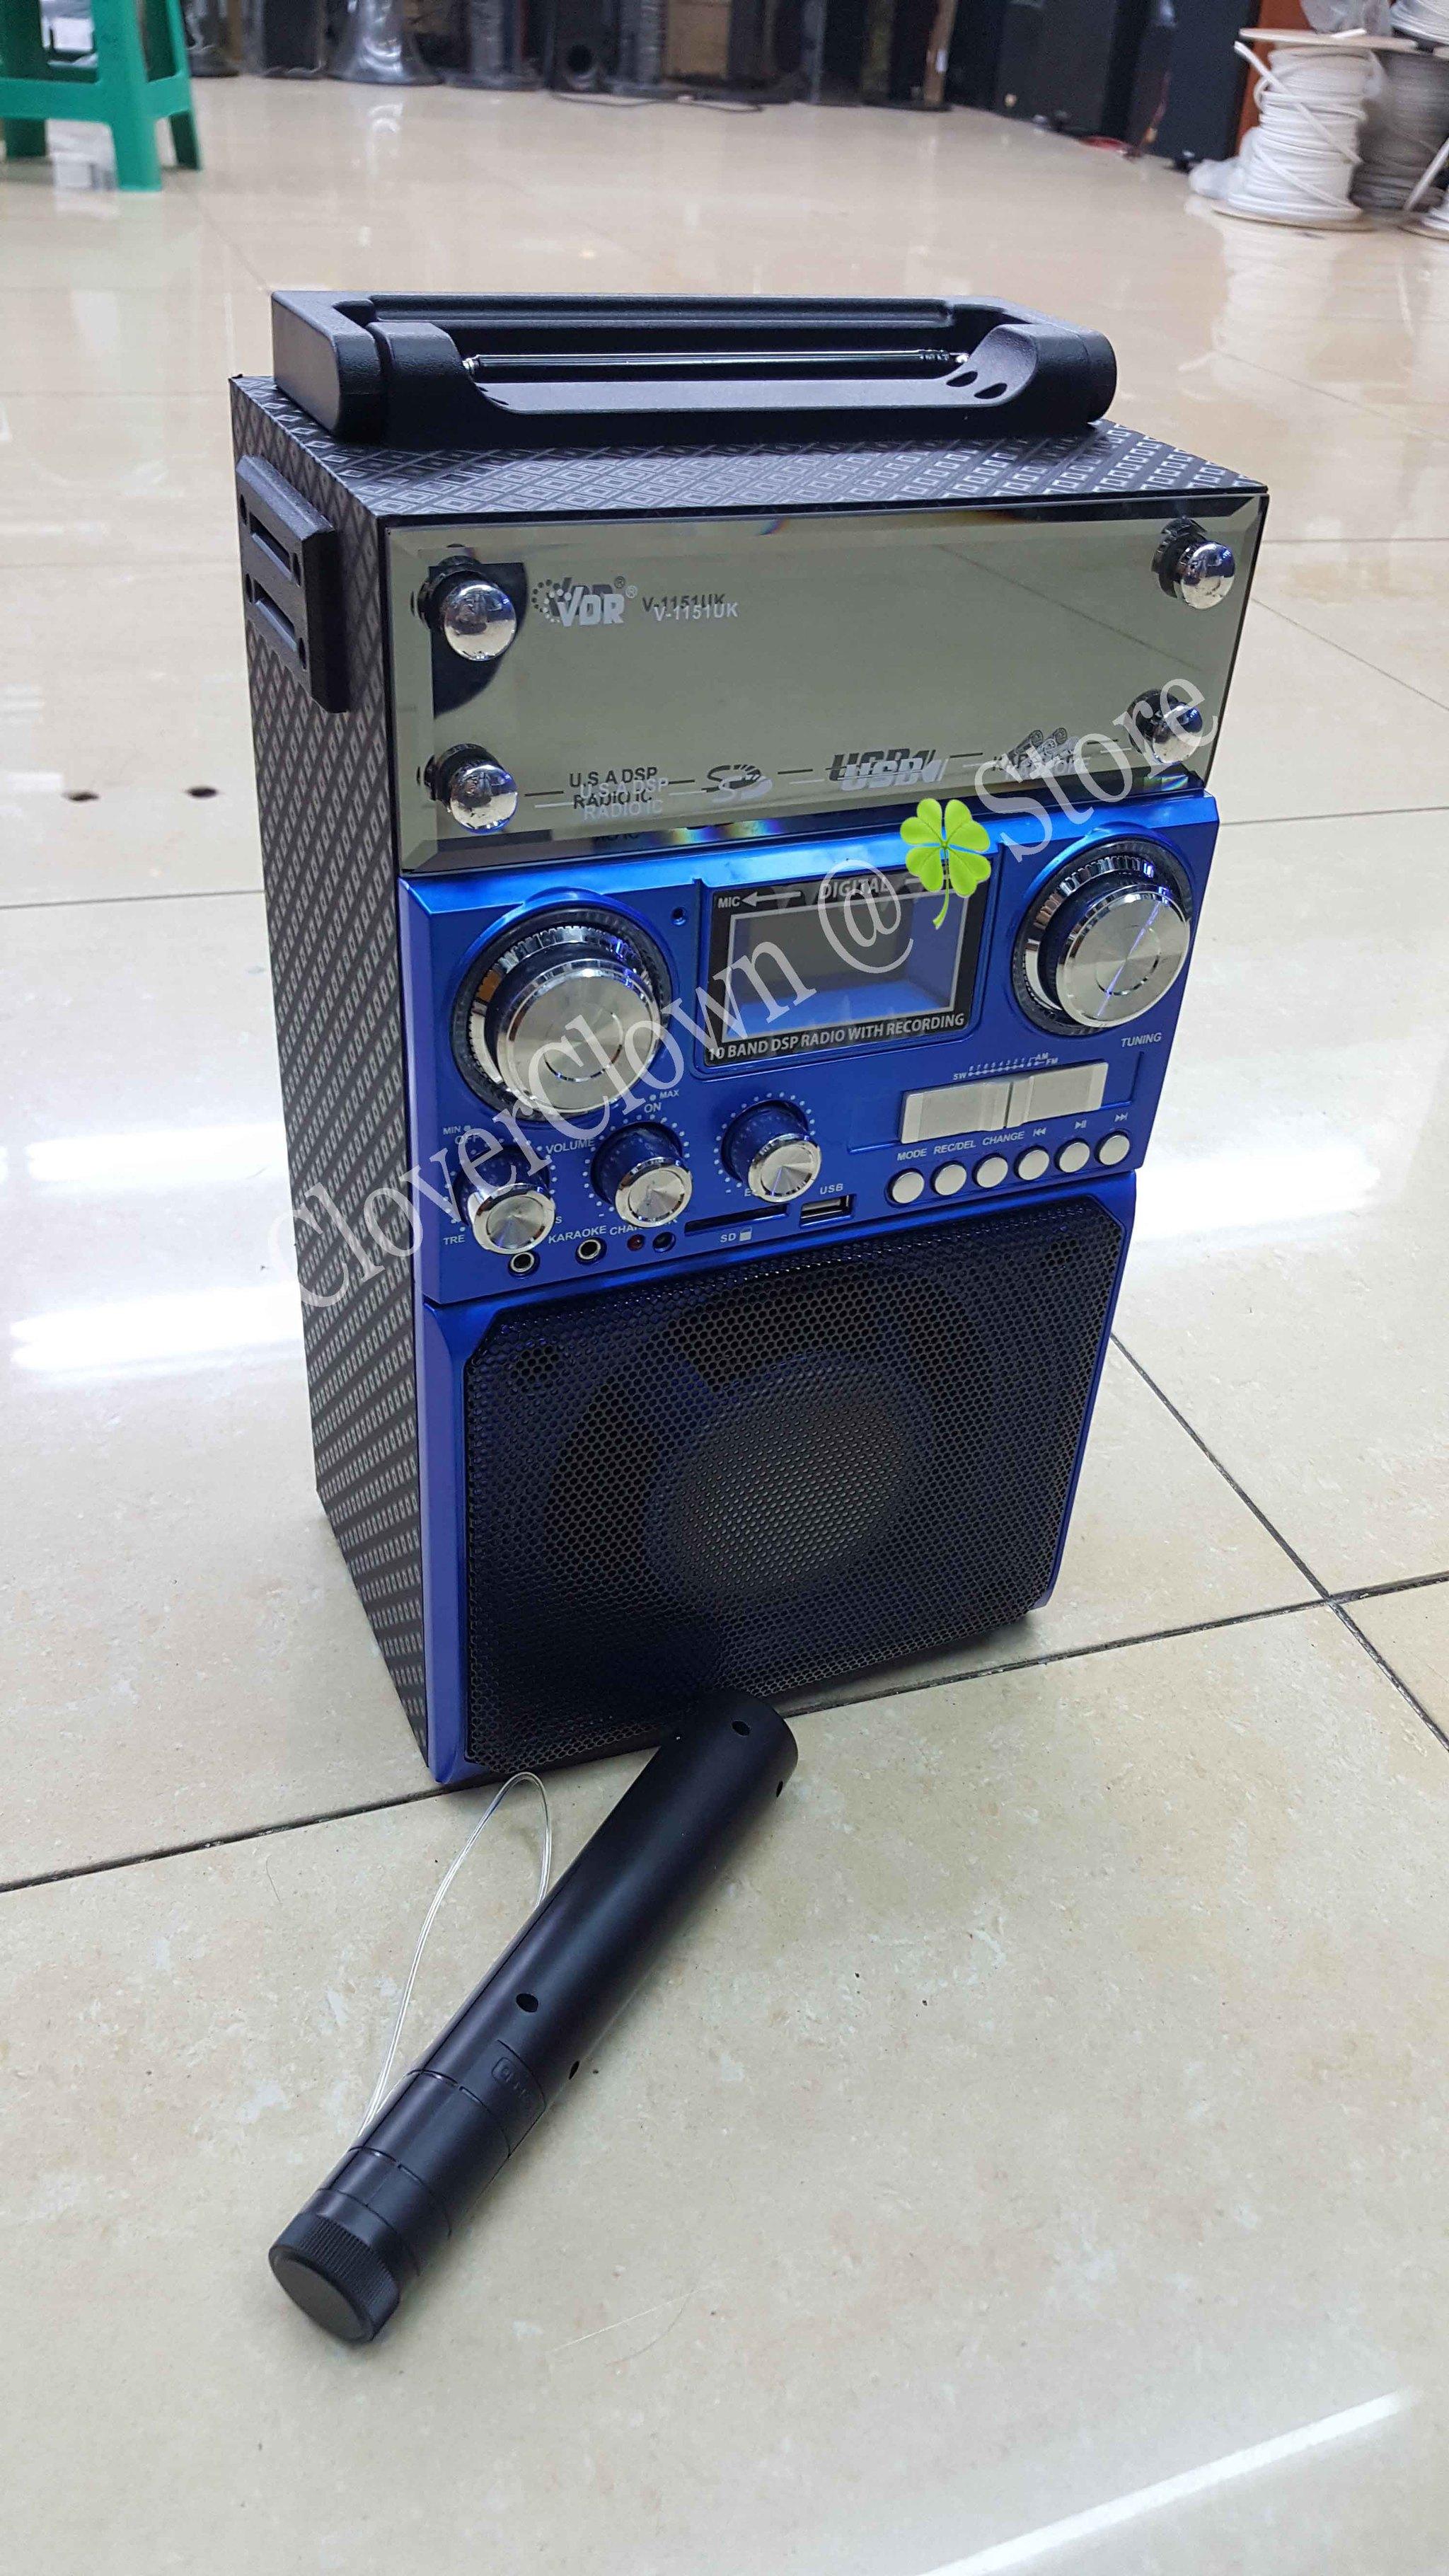 Jual Portable Wireless Meeting Amplifier VDR V1151UK